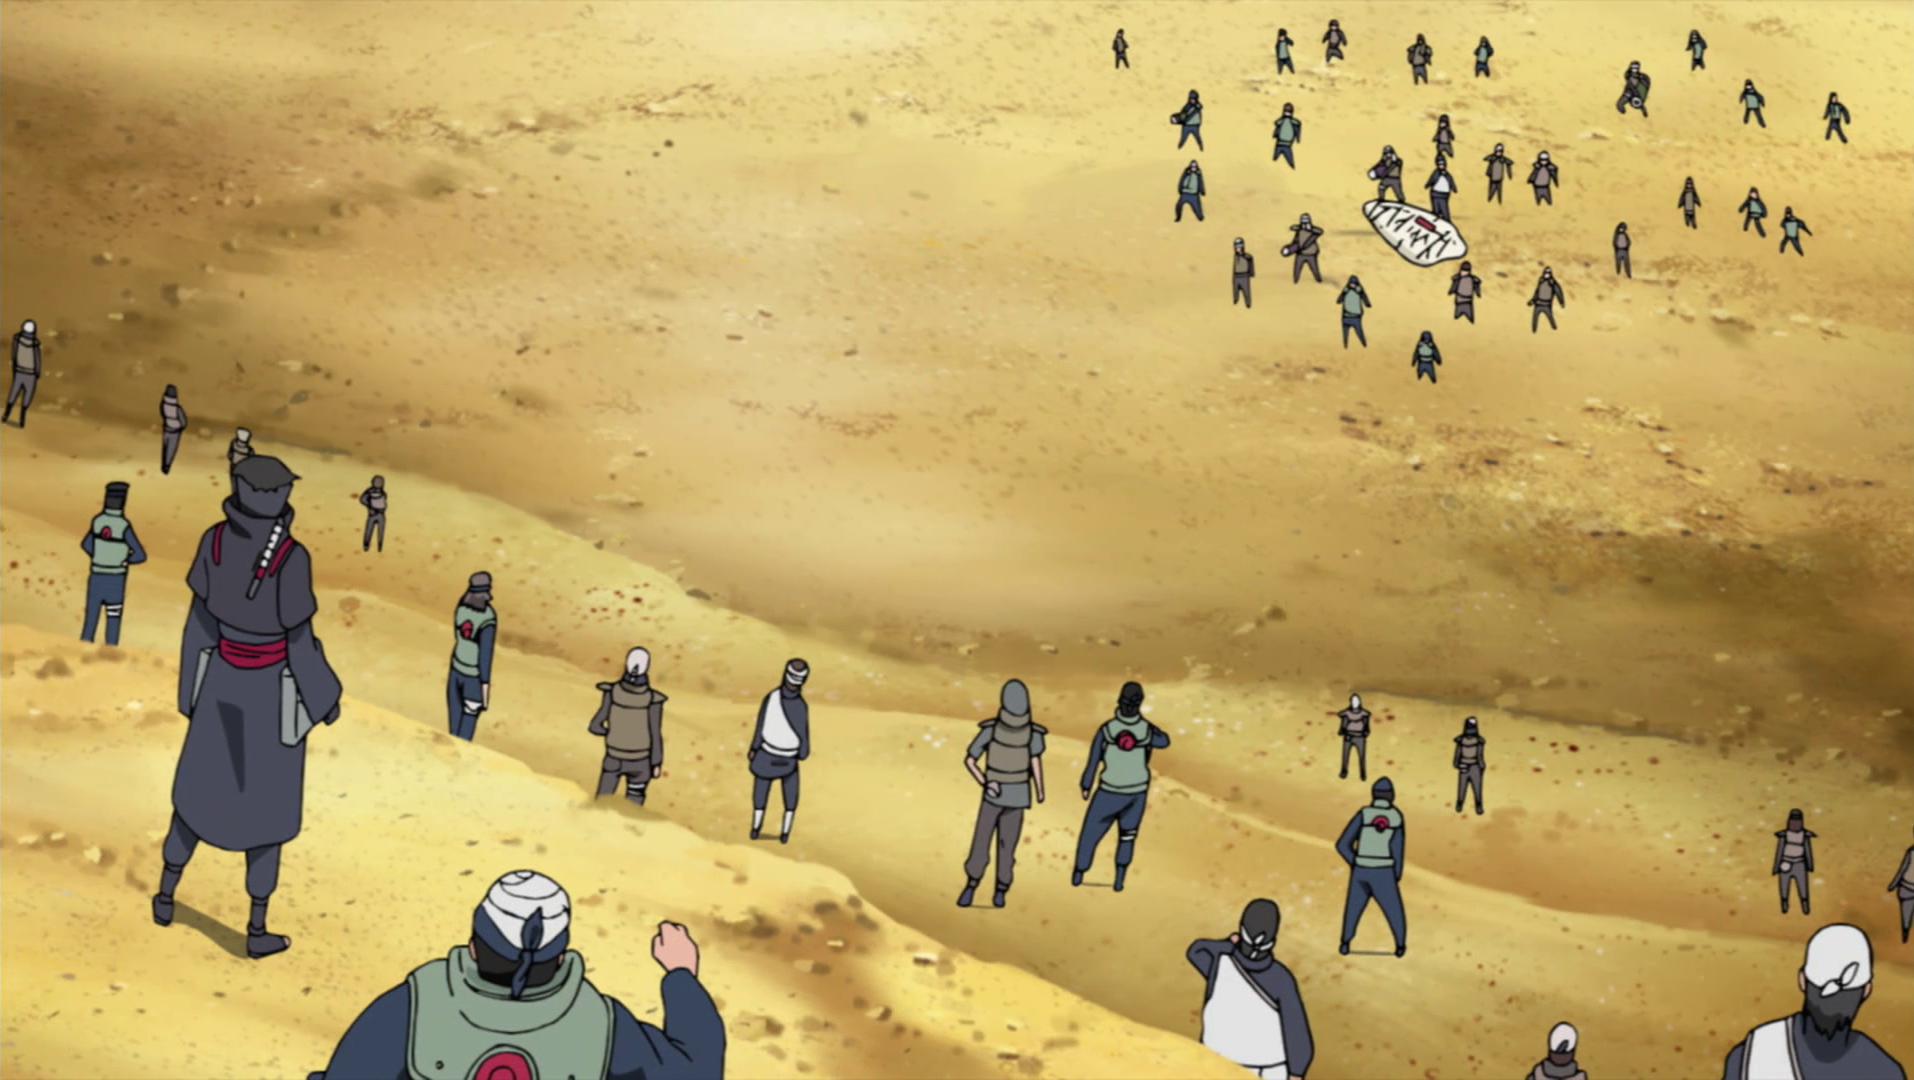 L'Armée de ninjas réincarnés !!